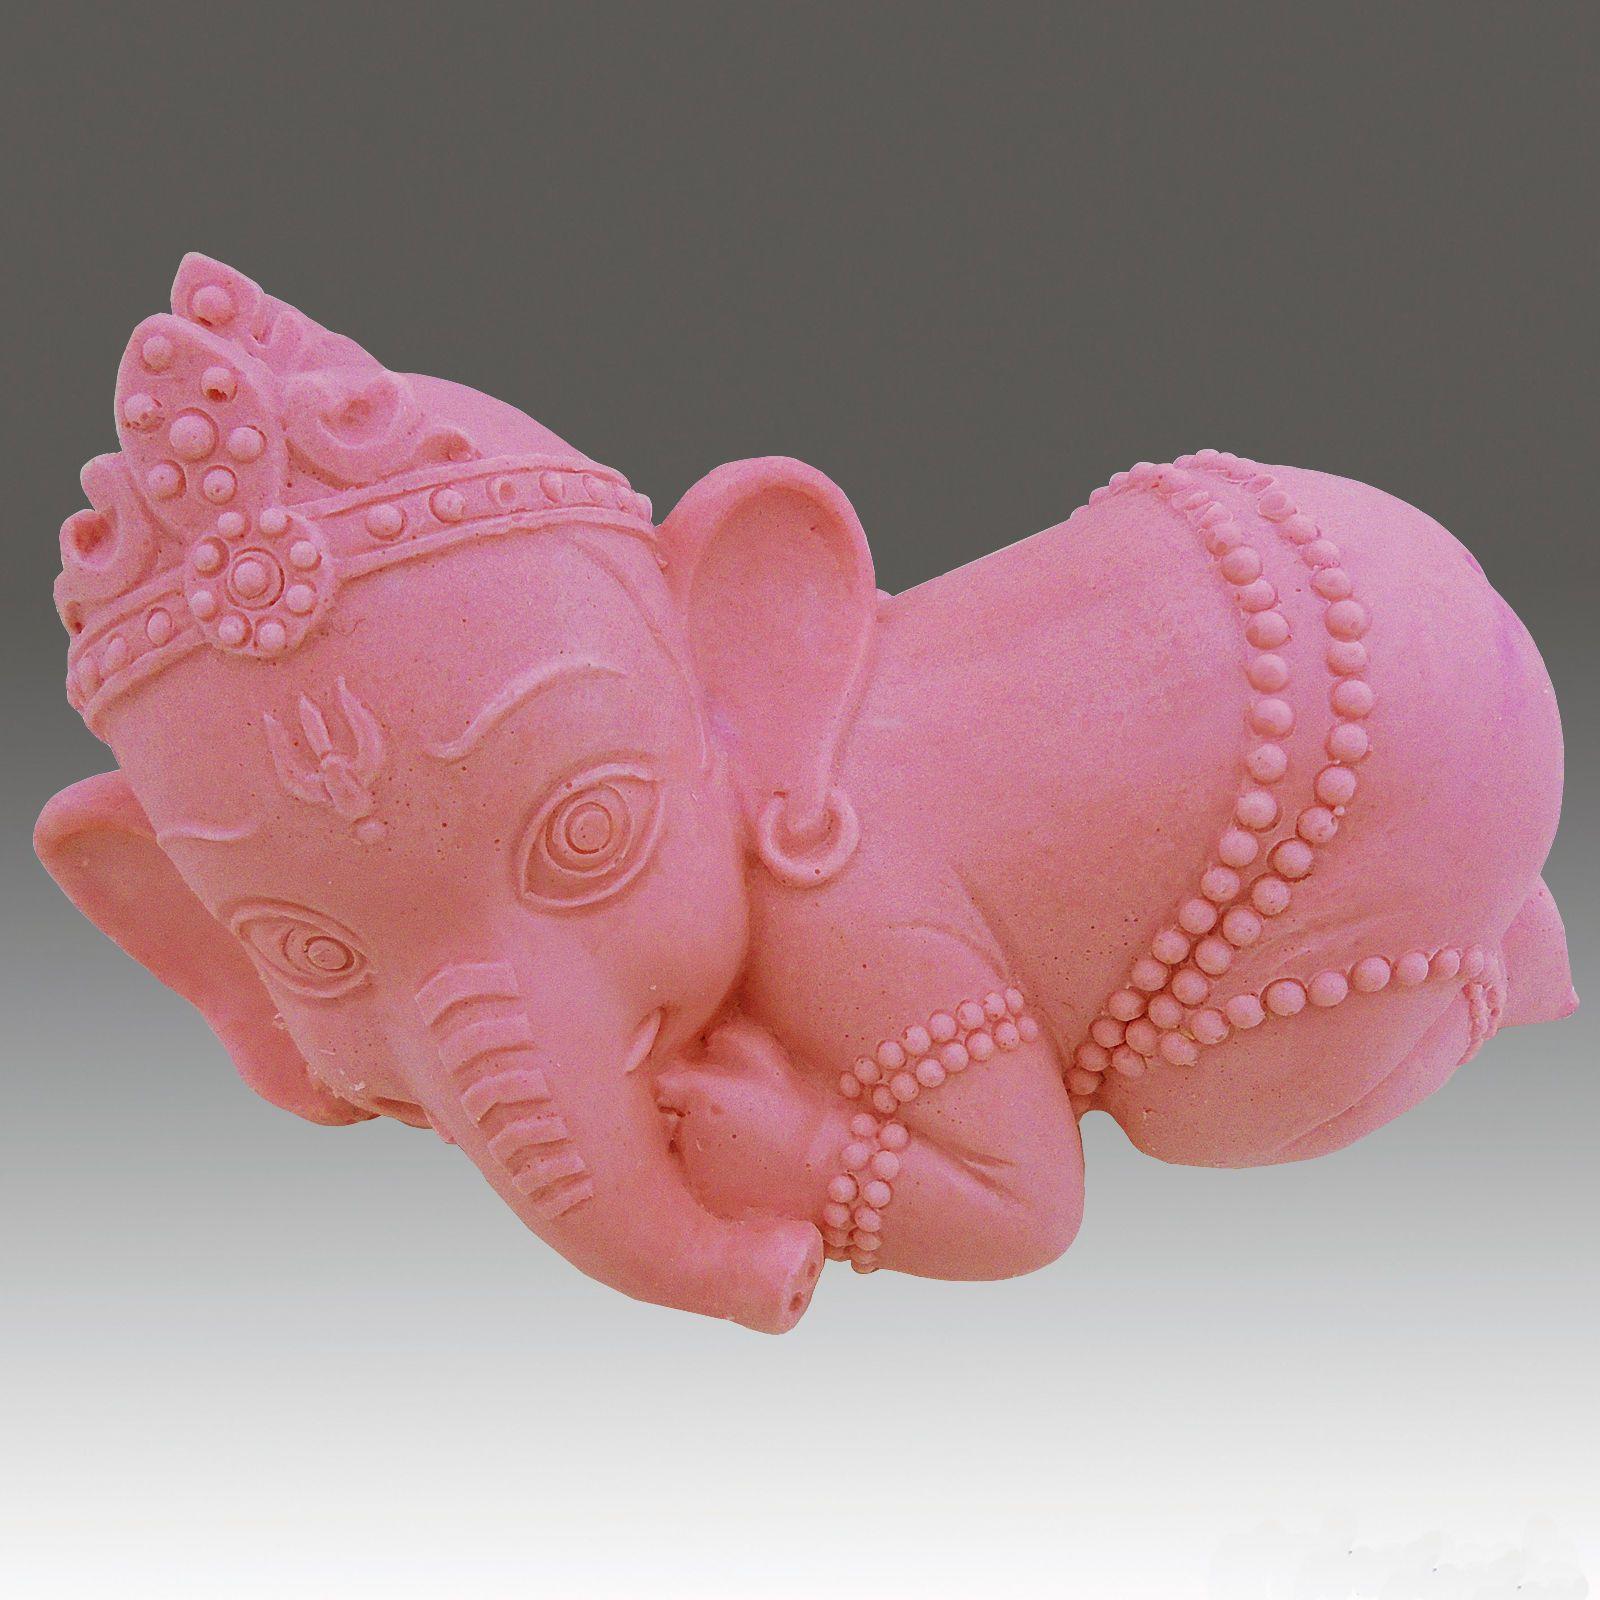 Ganesha Baby Sucking Finger- Detail of high relief sculpture